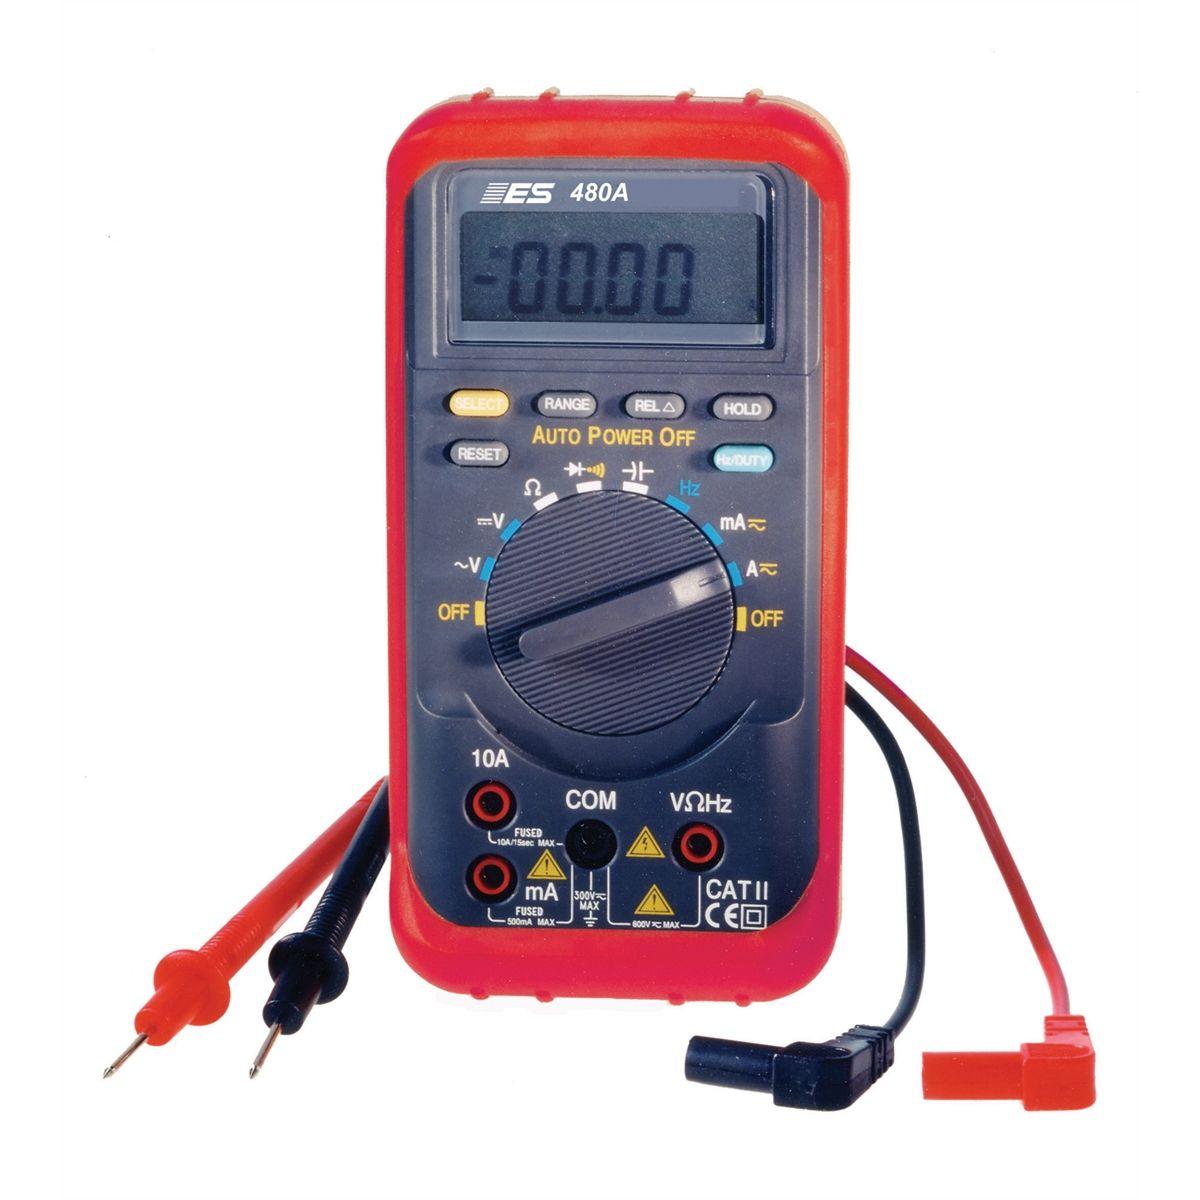 Automotive Digital Multimeter : Auto ranging digital multimeter esi a